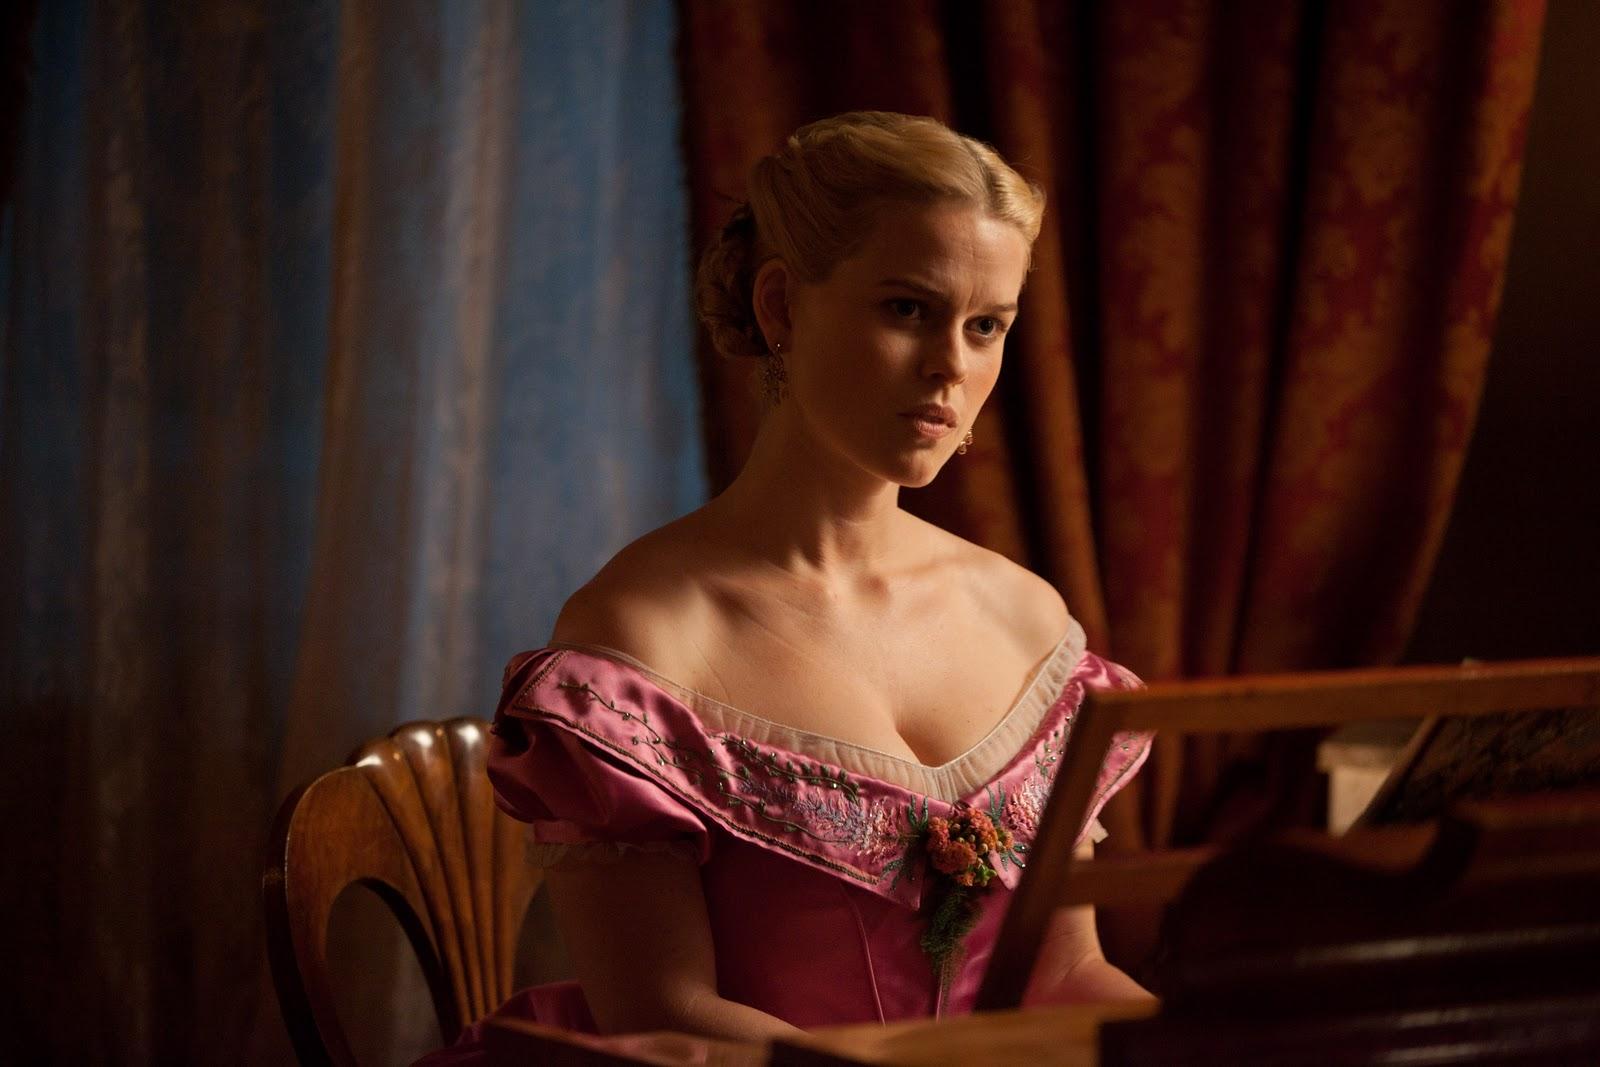 http://3.bp.blogspot.com/-HhwRaN66nlg/TnQsolVN2ZI/AAAAAAAAAsE/Q9qaOzOrEoY/s1600/Alice_Eve_first_look.jpg